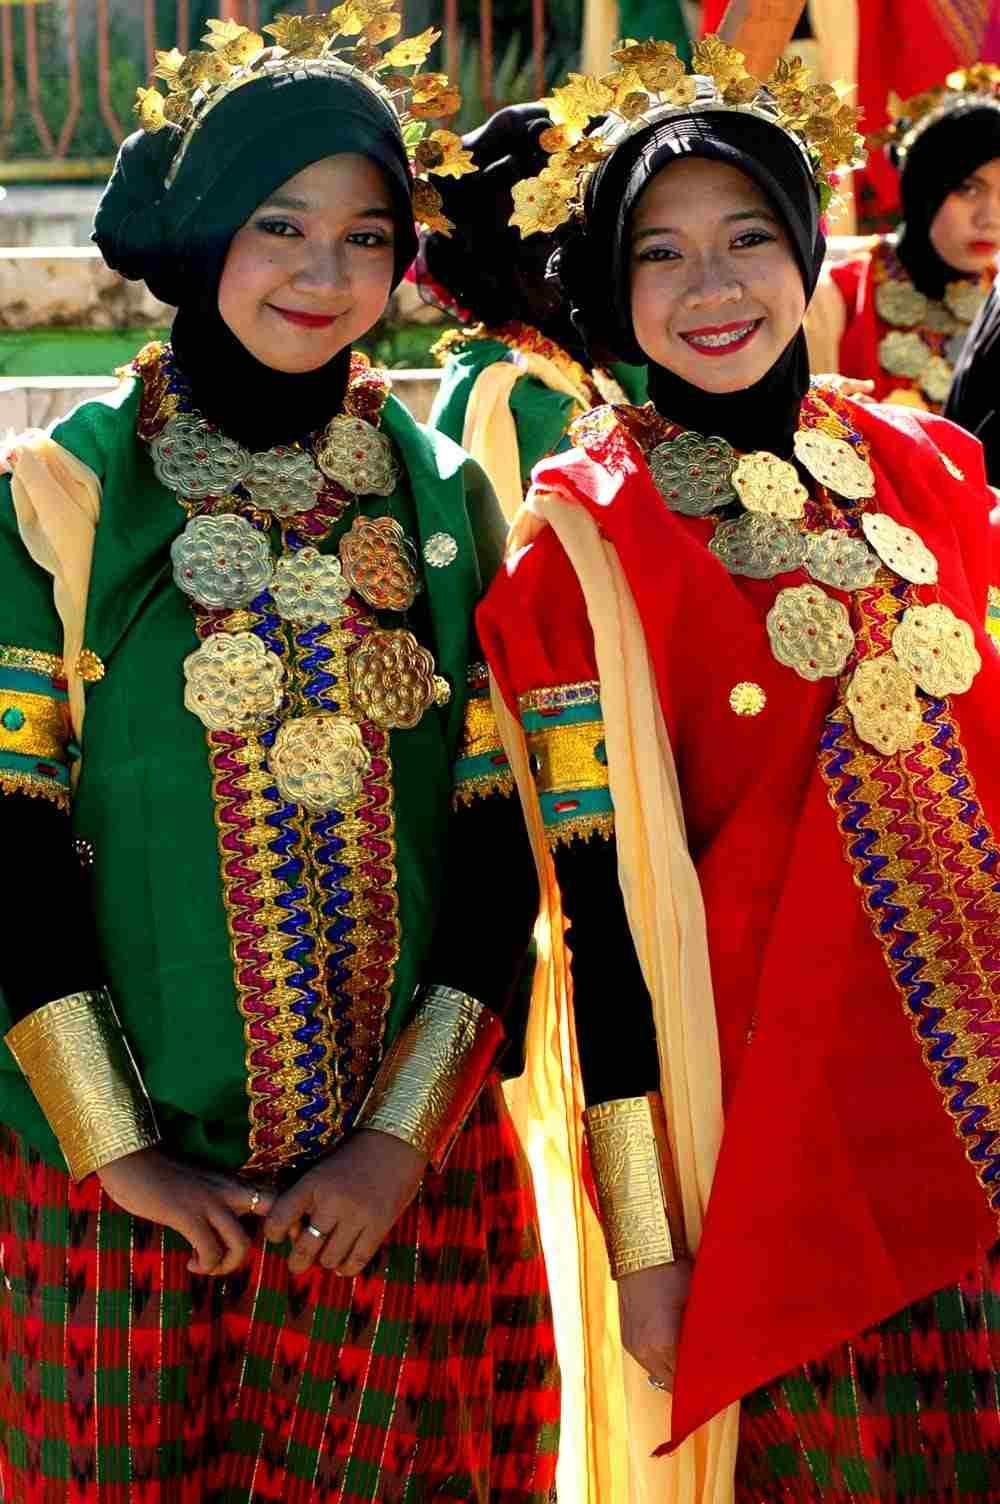 10 Pakaian Khas Sulawesi Selatan Lengkap dengan Aksesorisnya